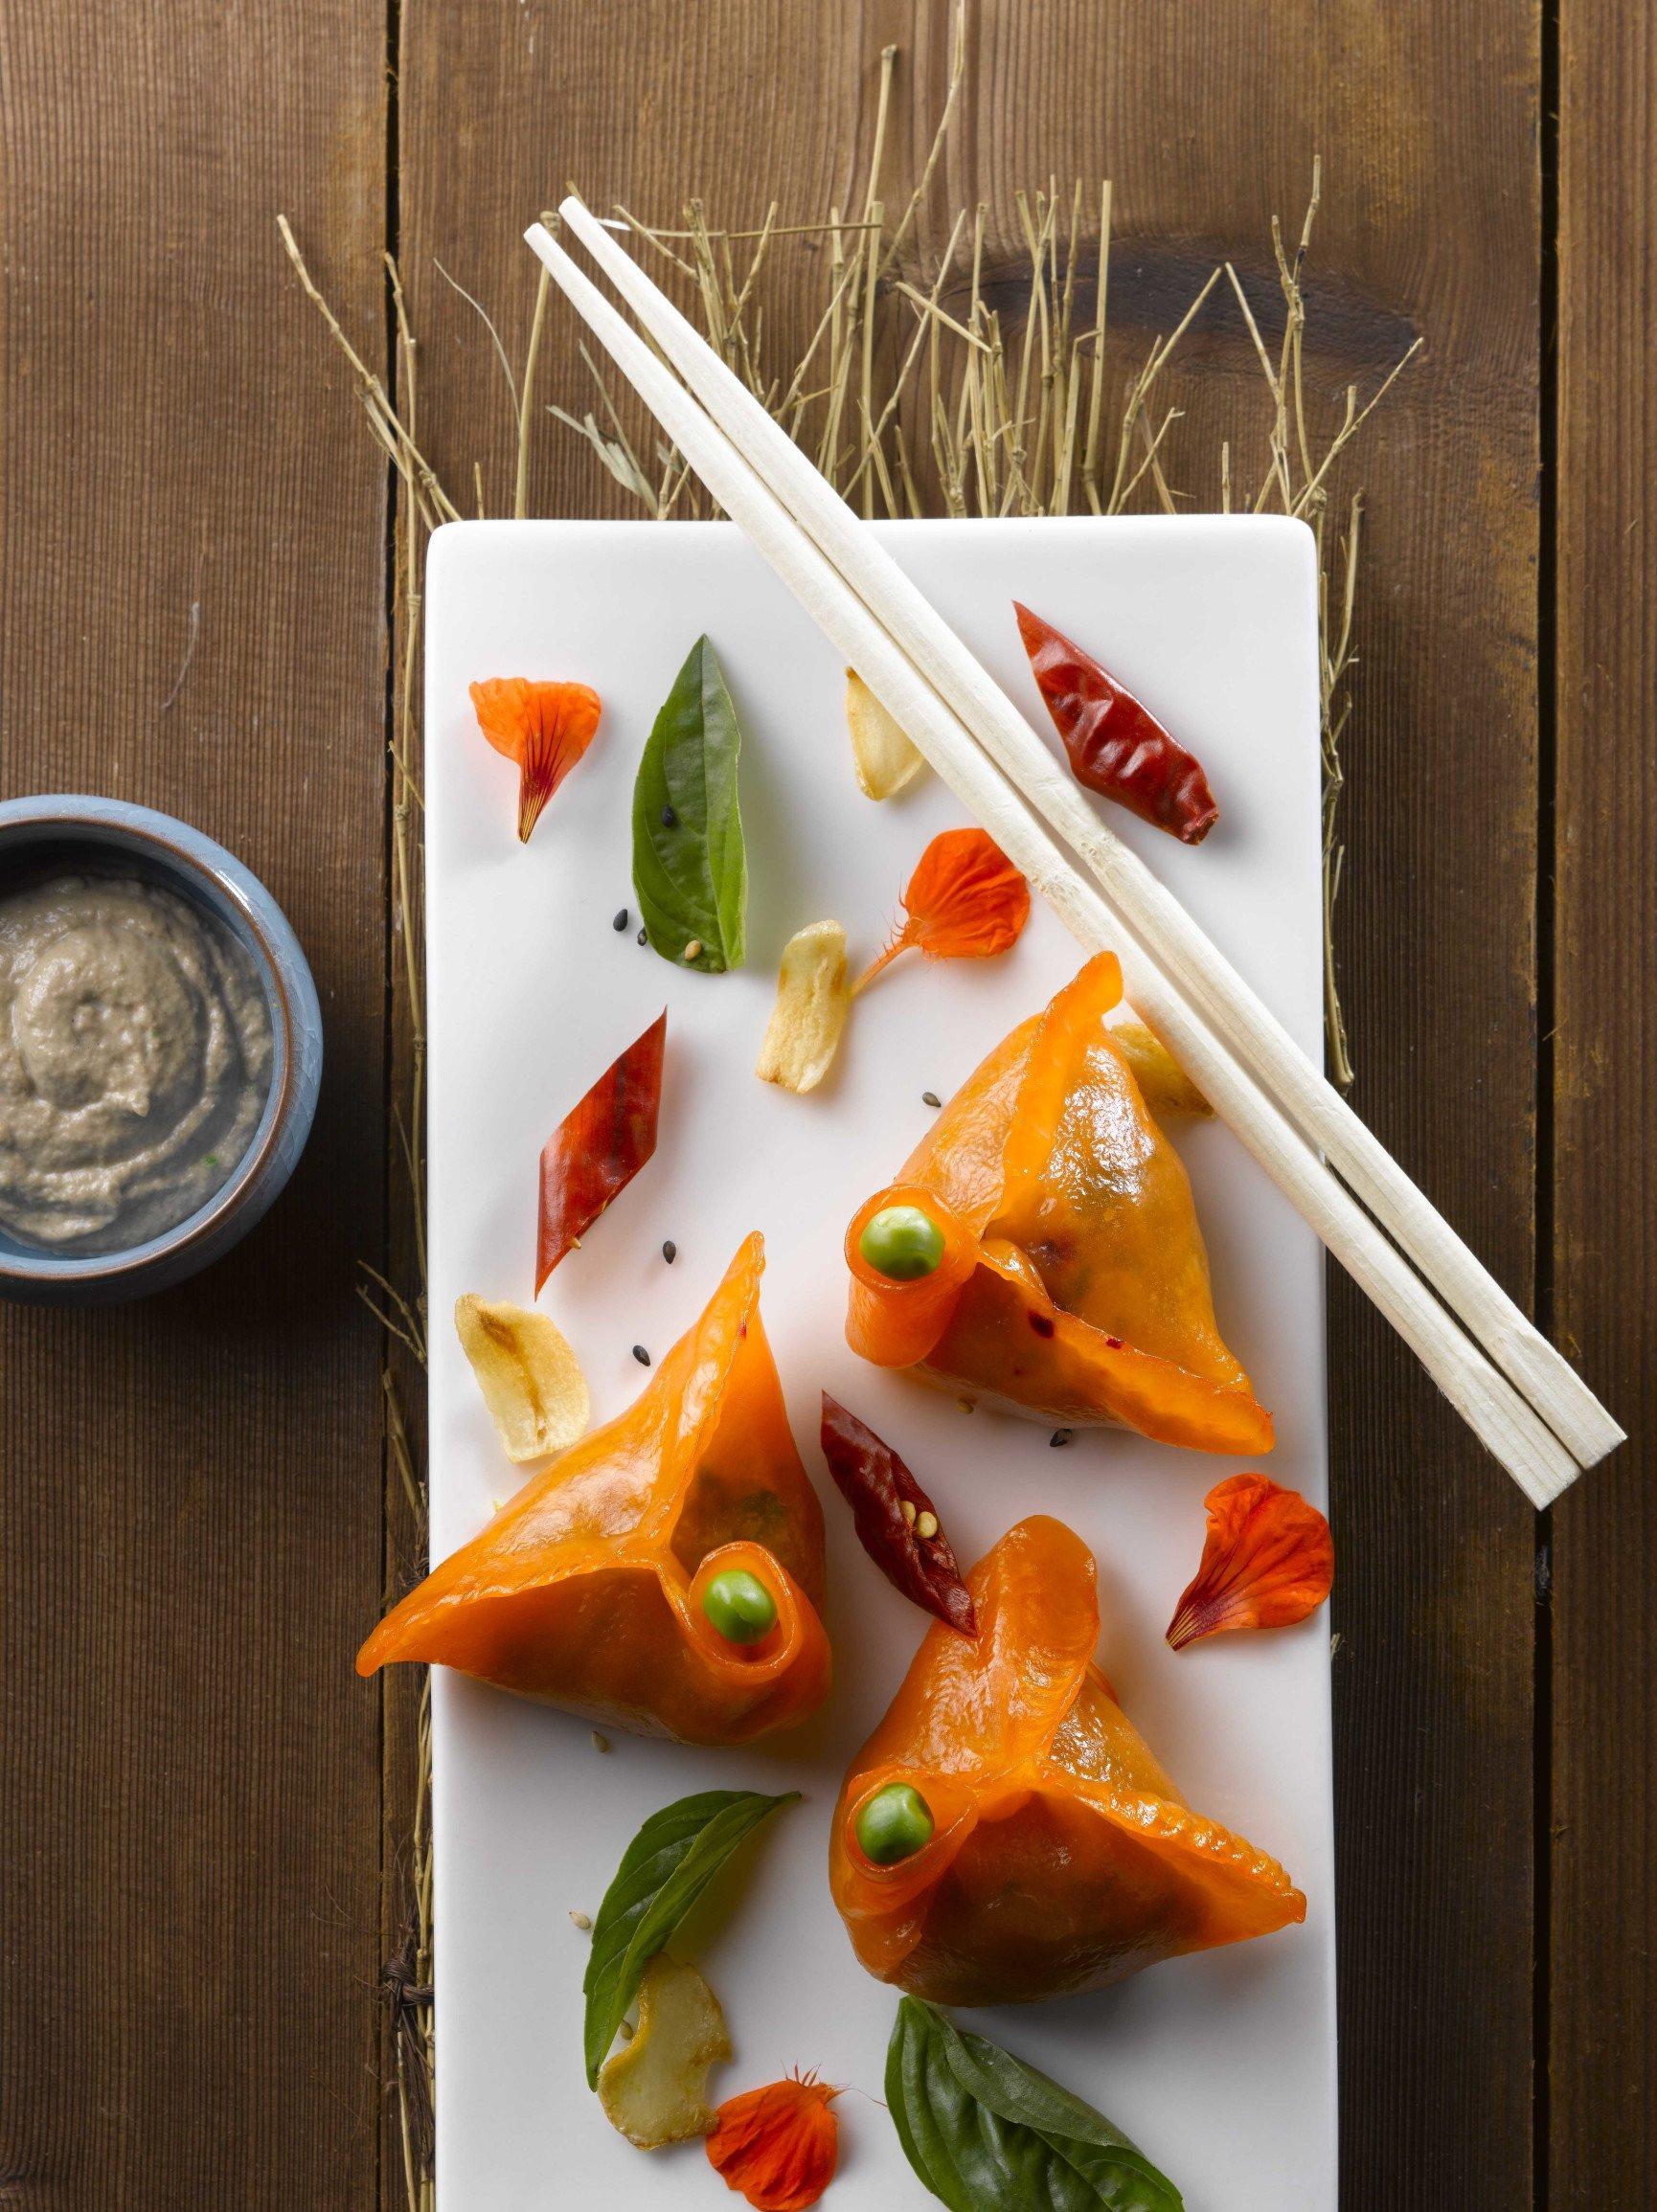 Pa Pa Ya Mumbai Introduces the World's largest Dim sum menu with 68 variants